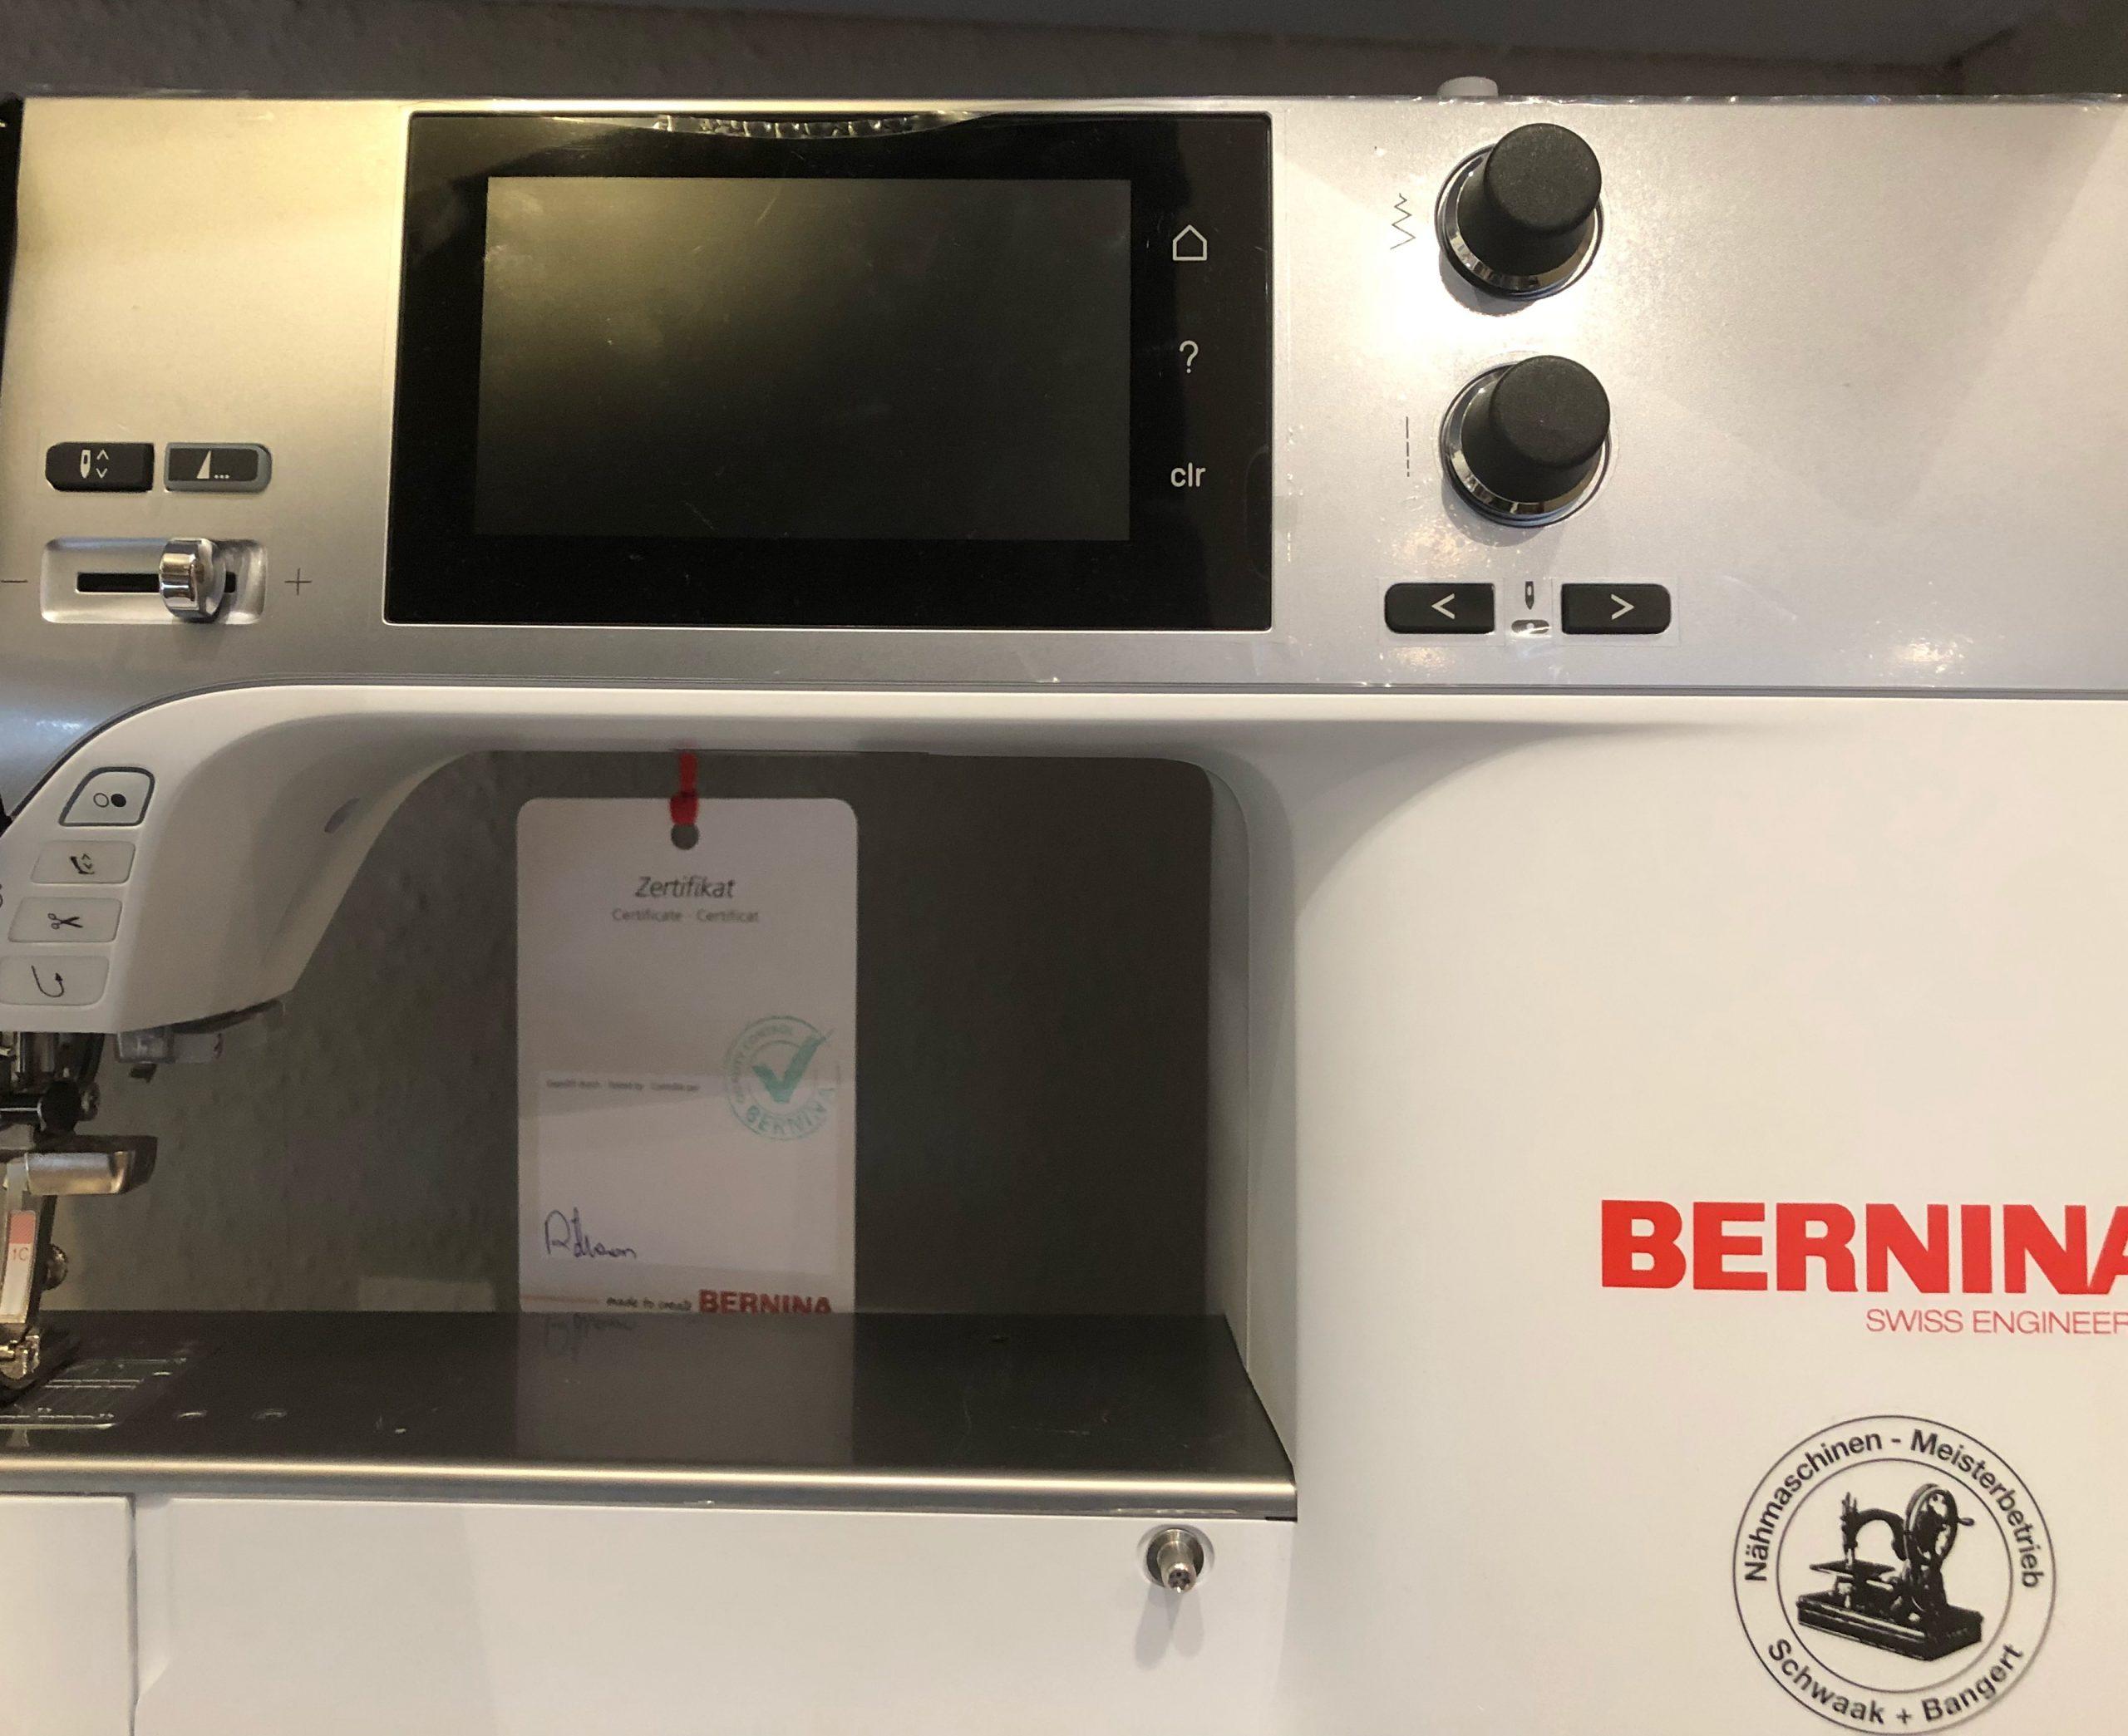 bernina_570_5er-serie_schwaak_und_bangert_schwelm_nähmaschinen_schwaaba_schwaba_display